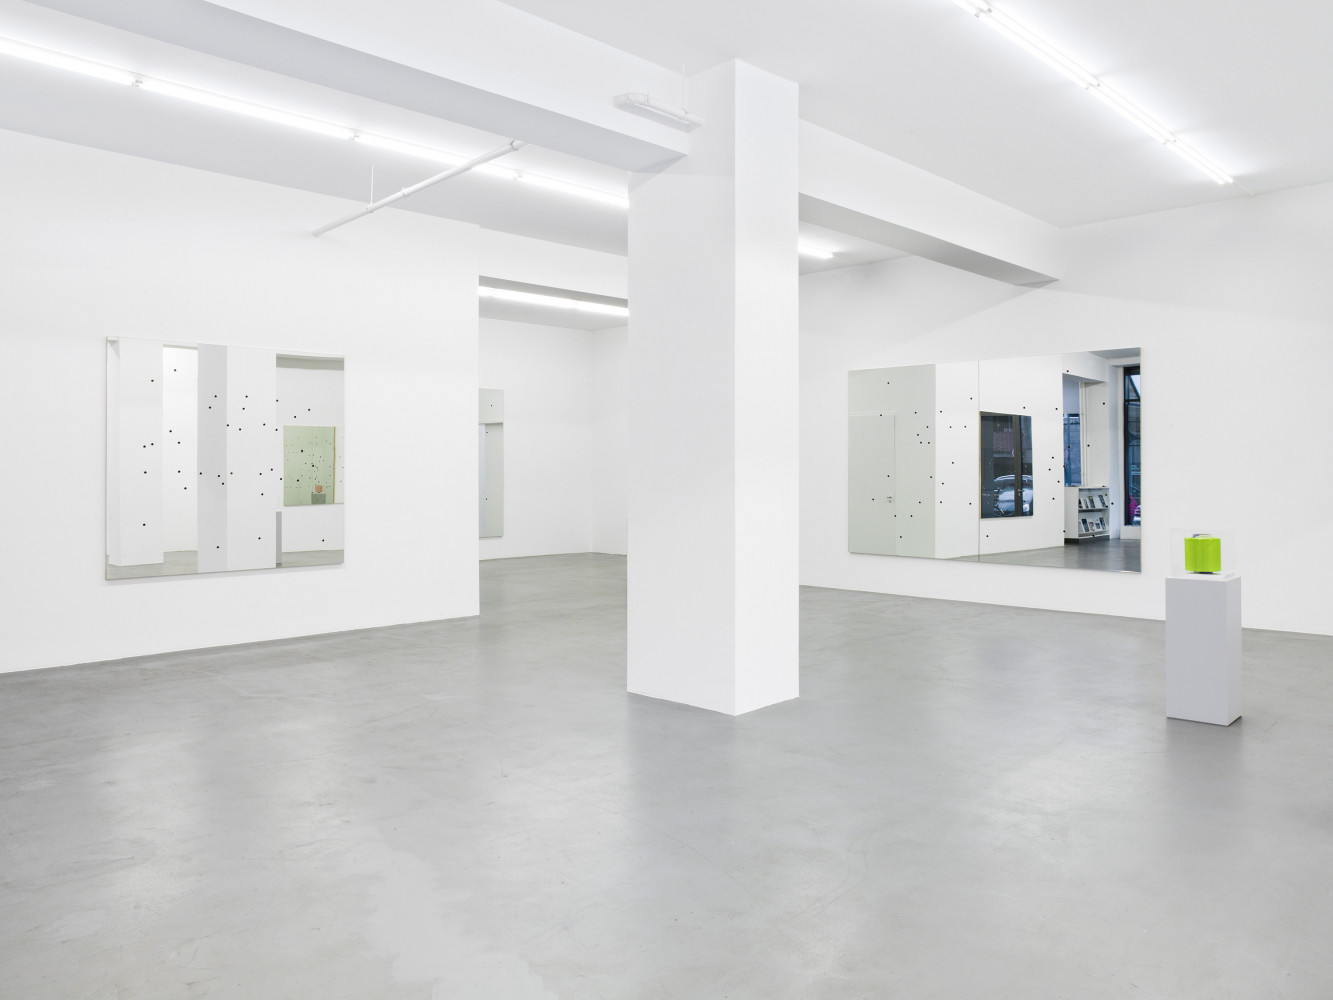 Alberto Garutti, 'Là, Ora', Installation view, Buchmann Galerie, 2015